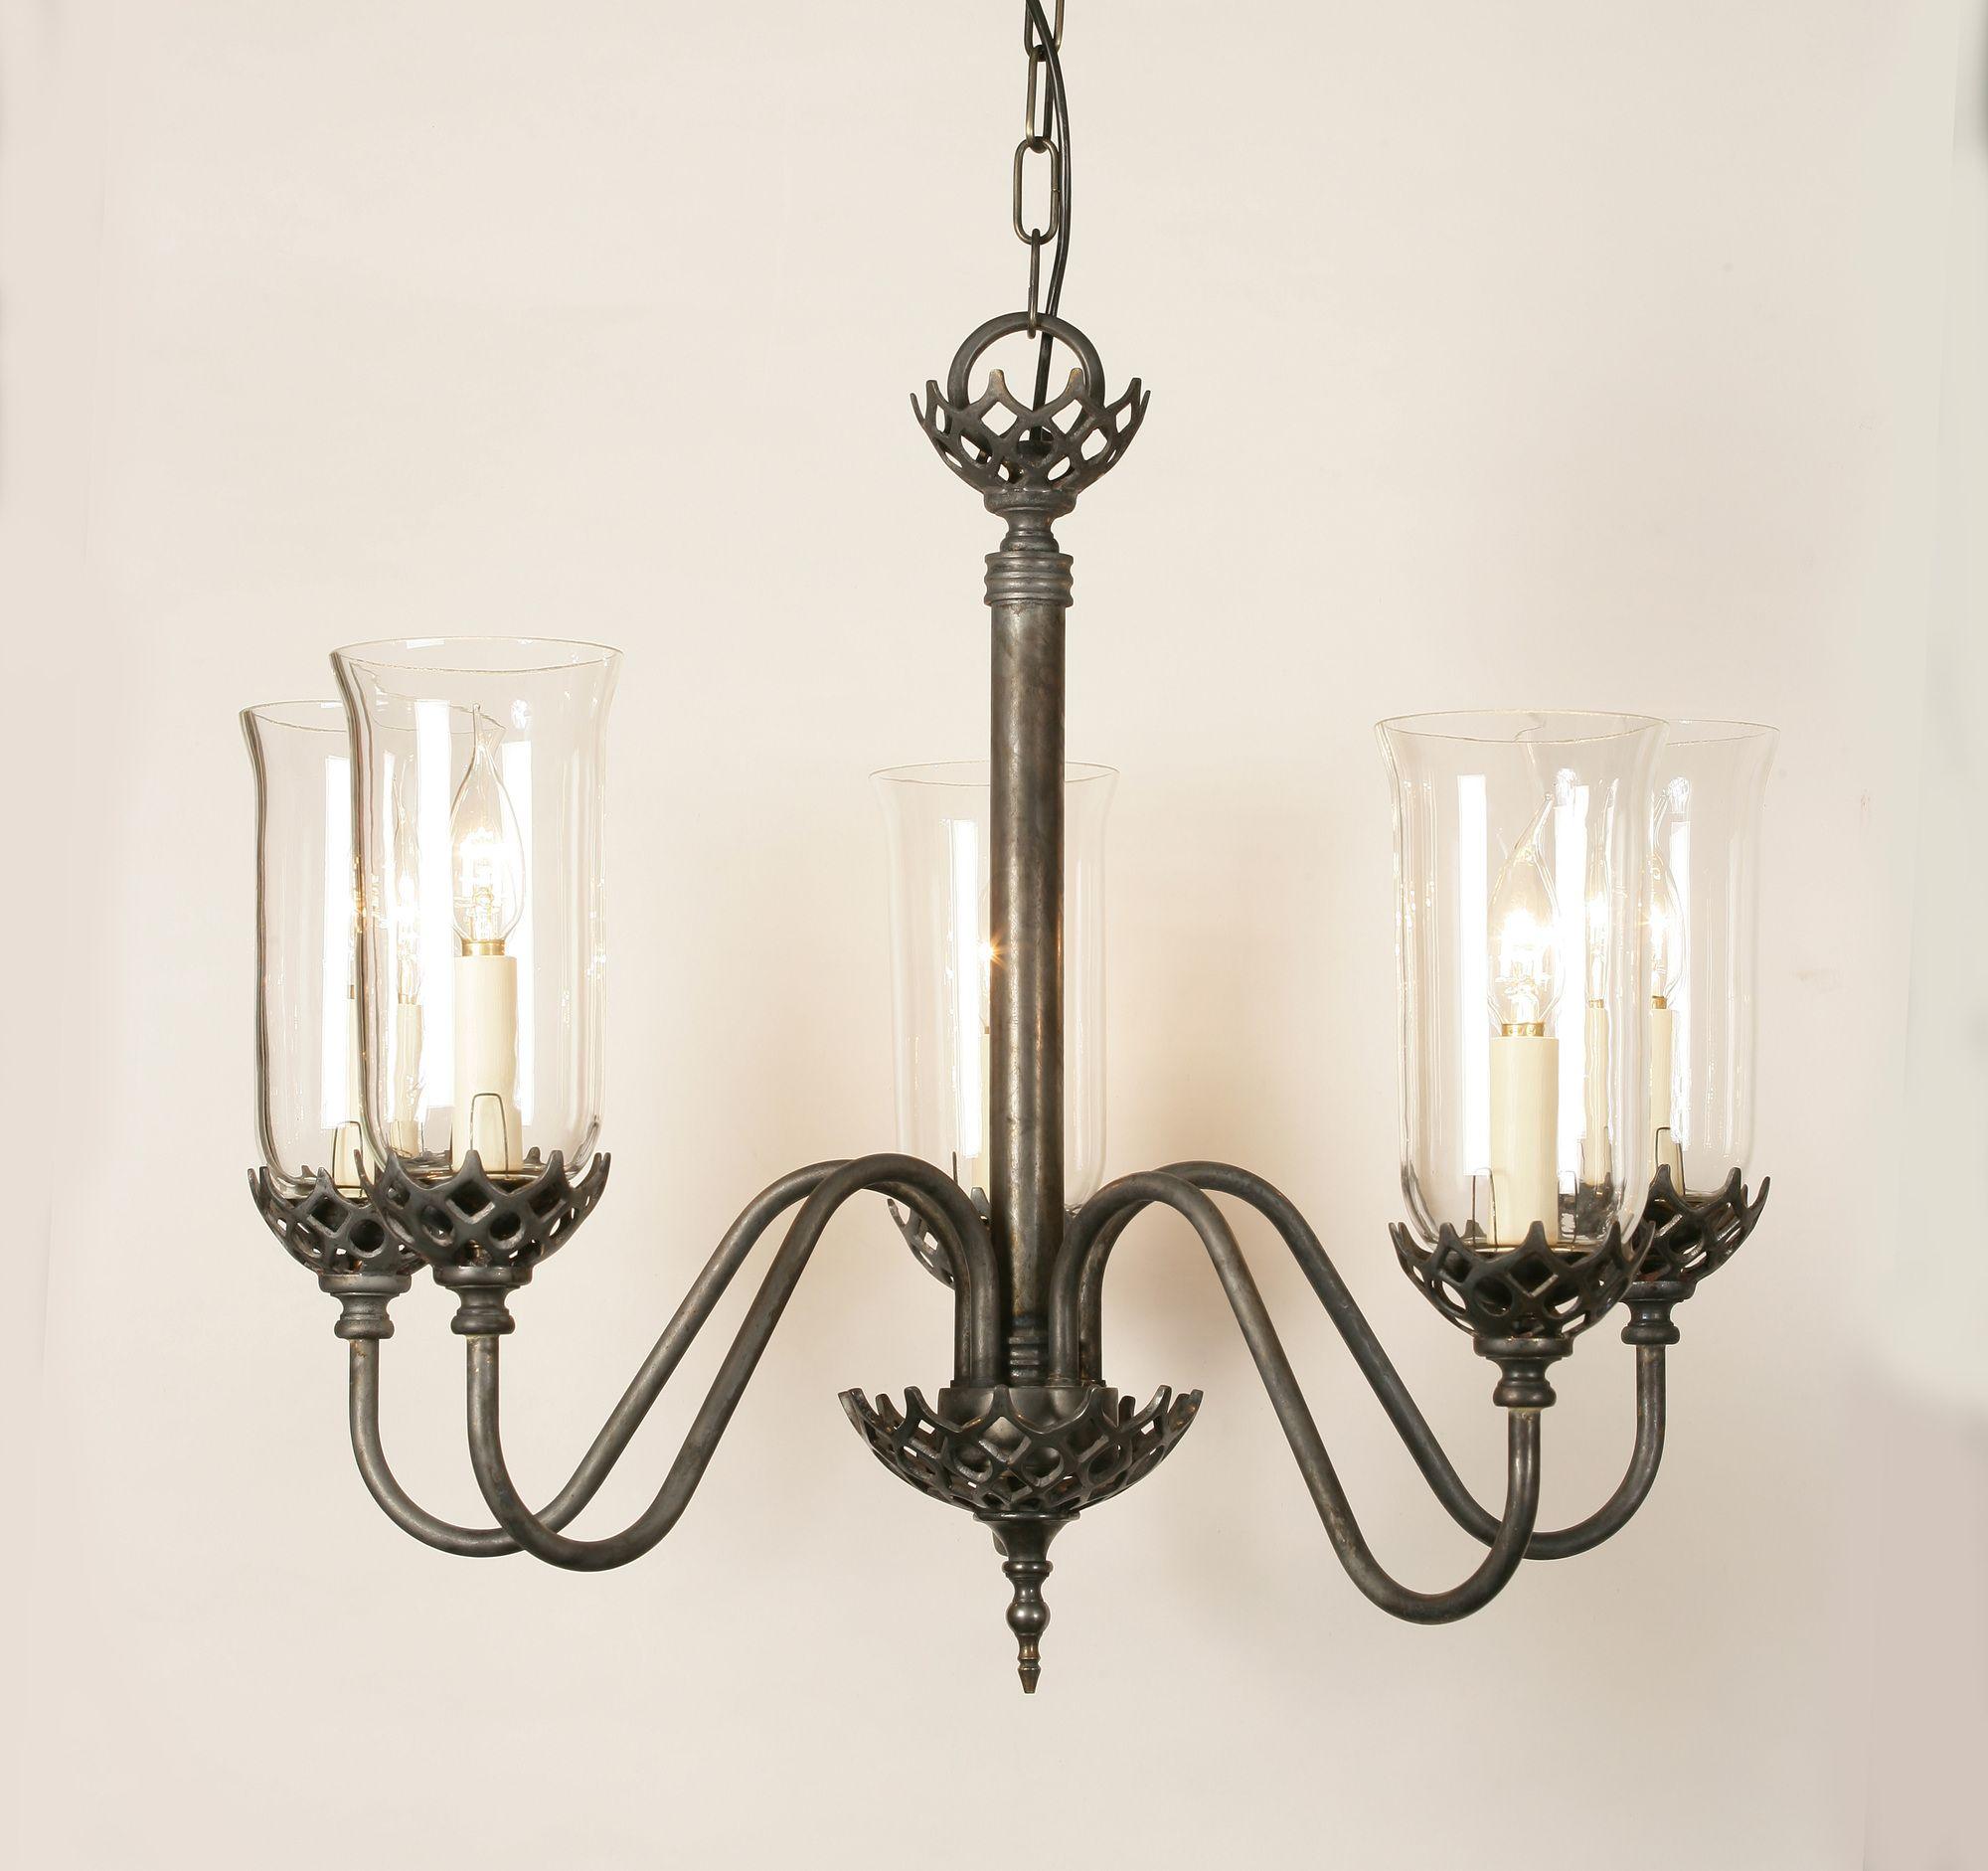 Edwardian Bathroom Ceiling Lights pineapple pendant light shade clear tiny 5 light pendant with